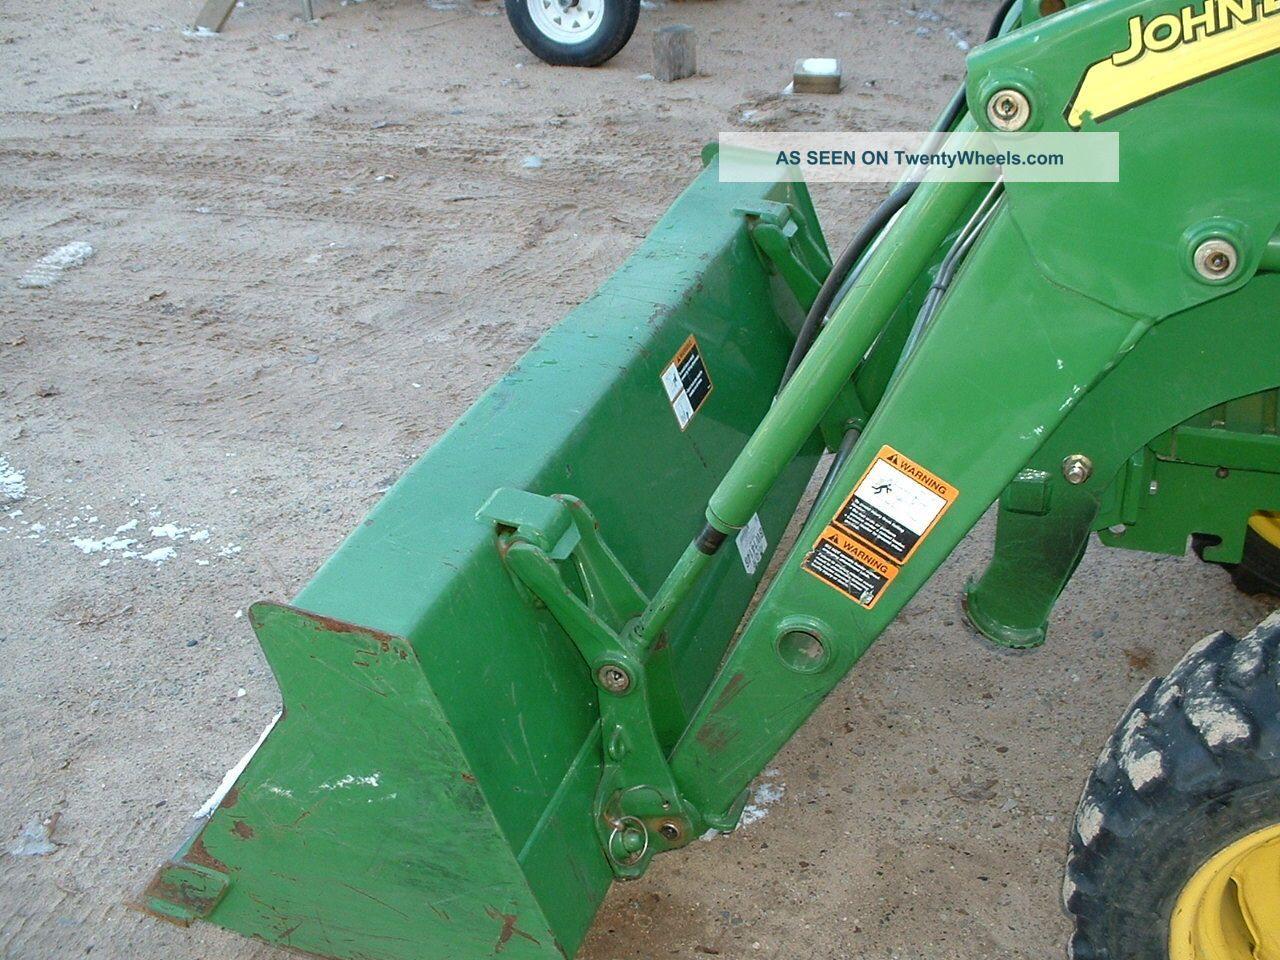 John Deere Tractor 3005 Wiring Diagram Descargar Sendblaster Pro 2 410g 650 Pdfsdocuments2com